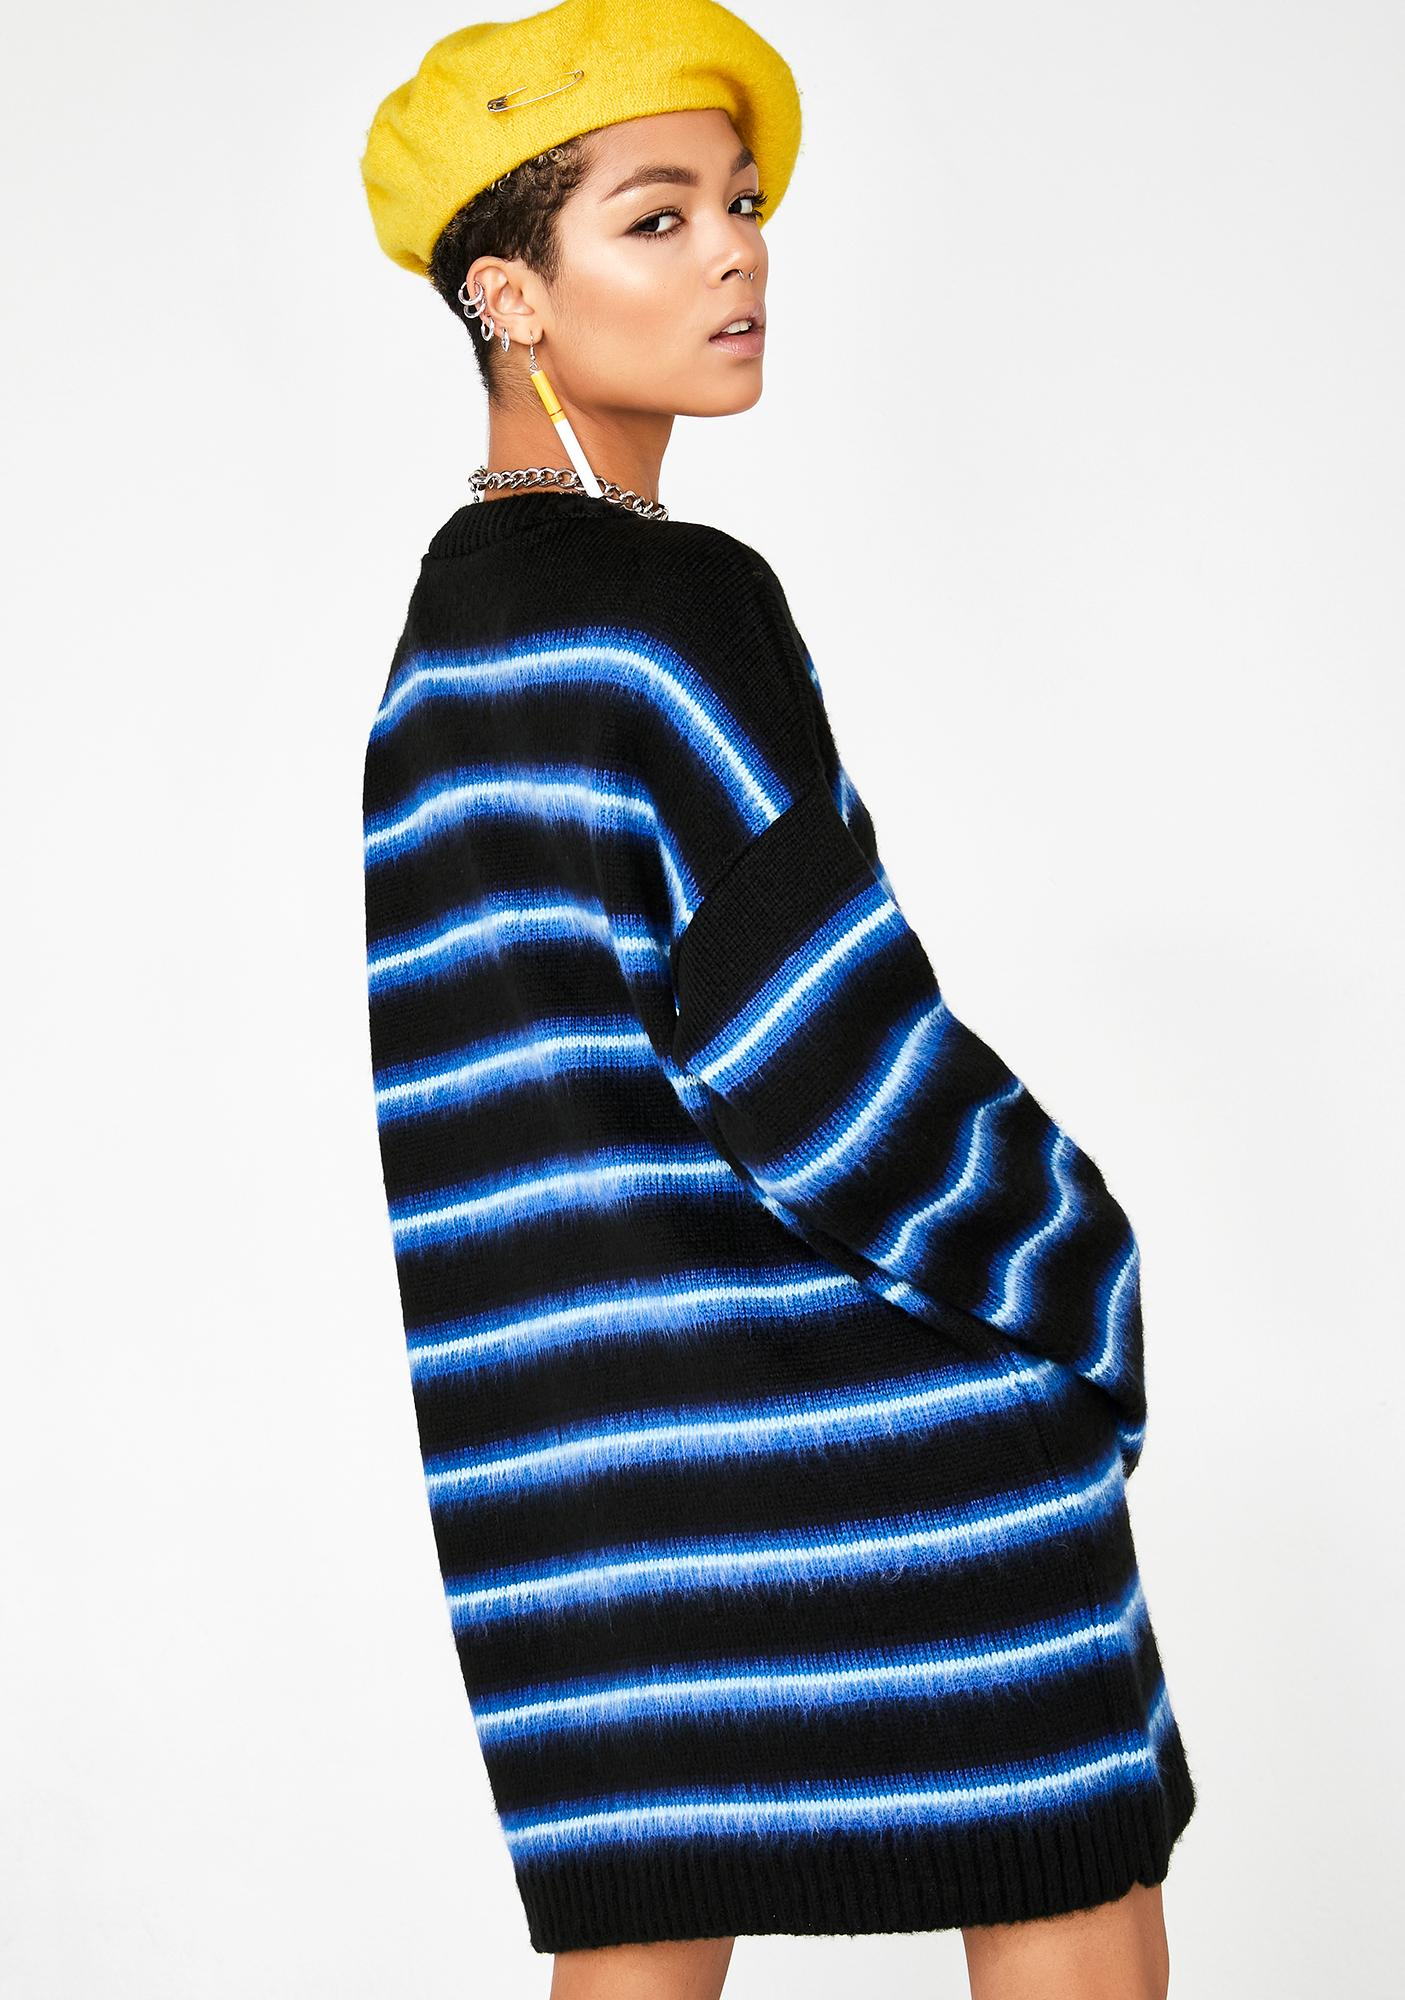 The Ragged Priest Stripe Brush Knit Dress